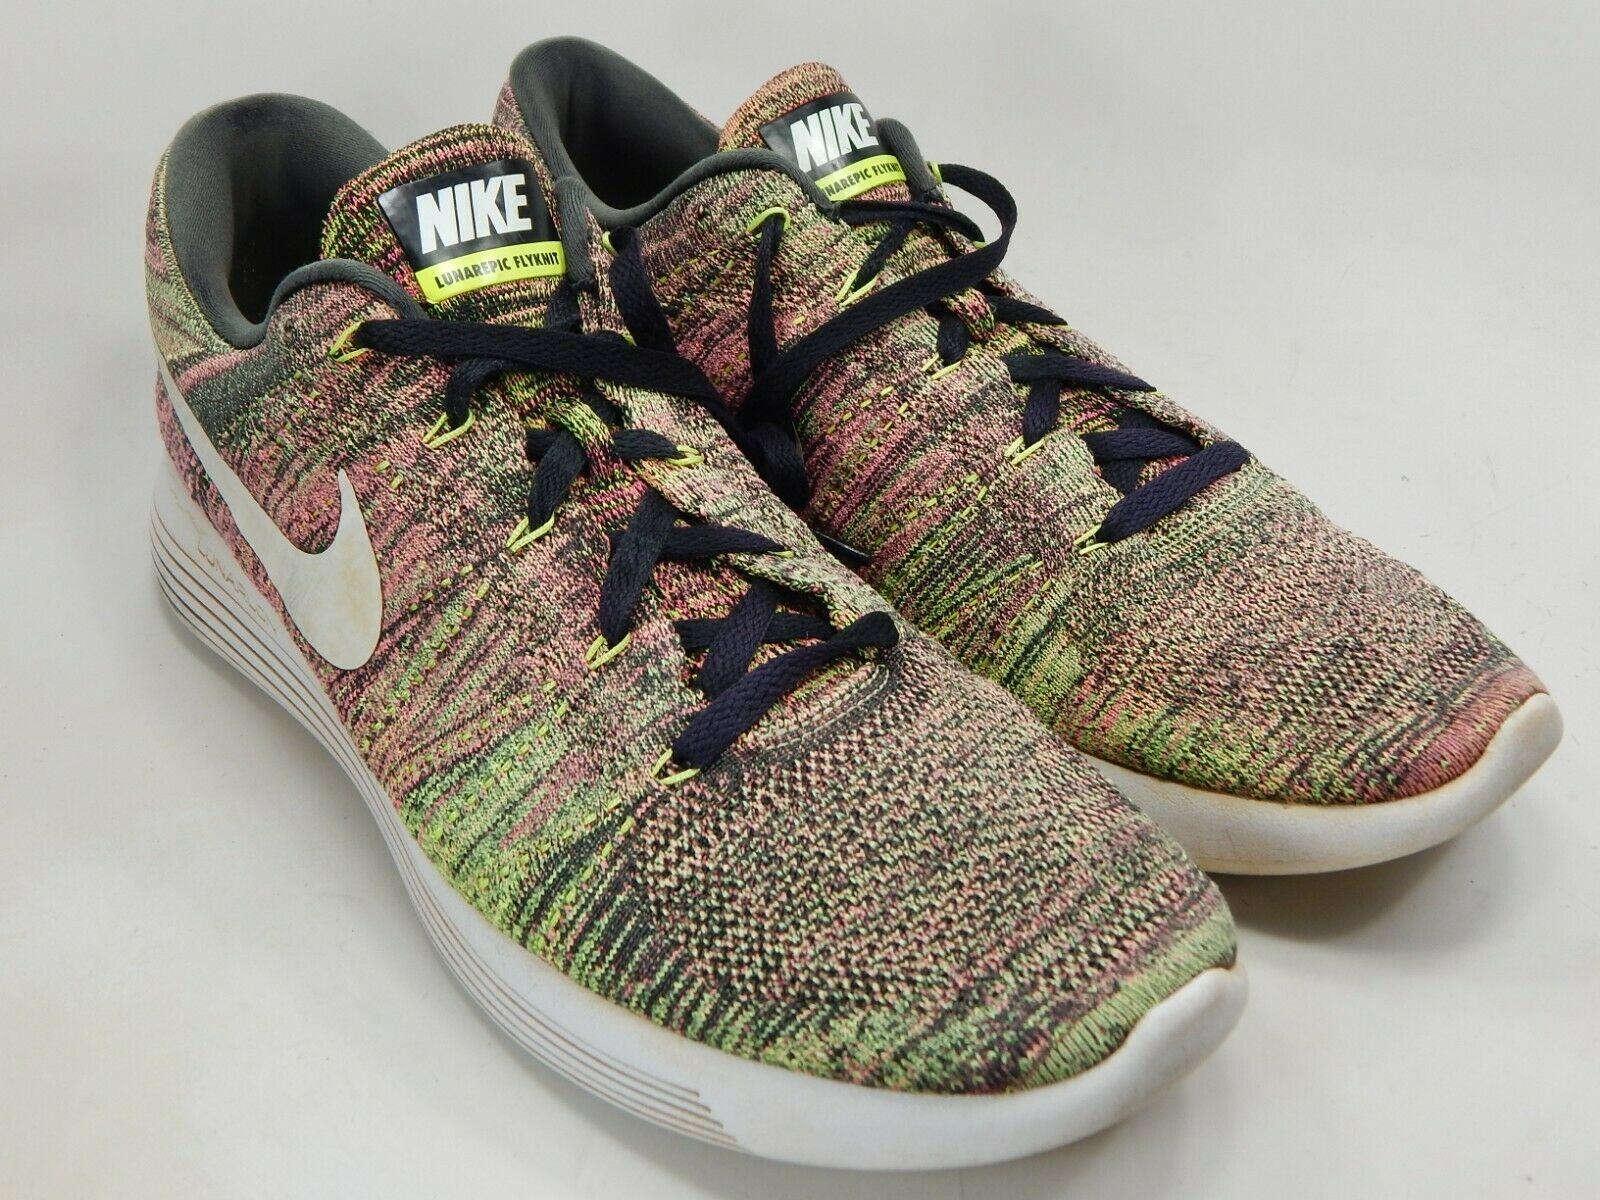 25274e2c44d0 Nike LunarEpic Low Flyknit Size 14 M (D) EU 48.5 Men s Running Shoes ...